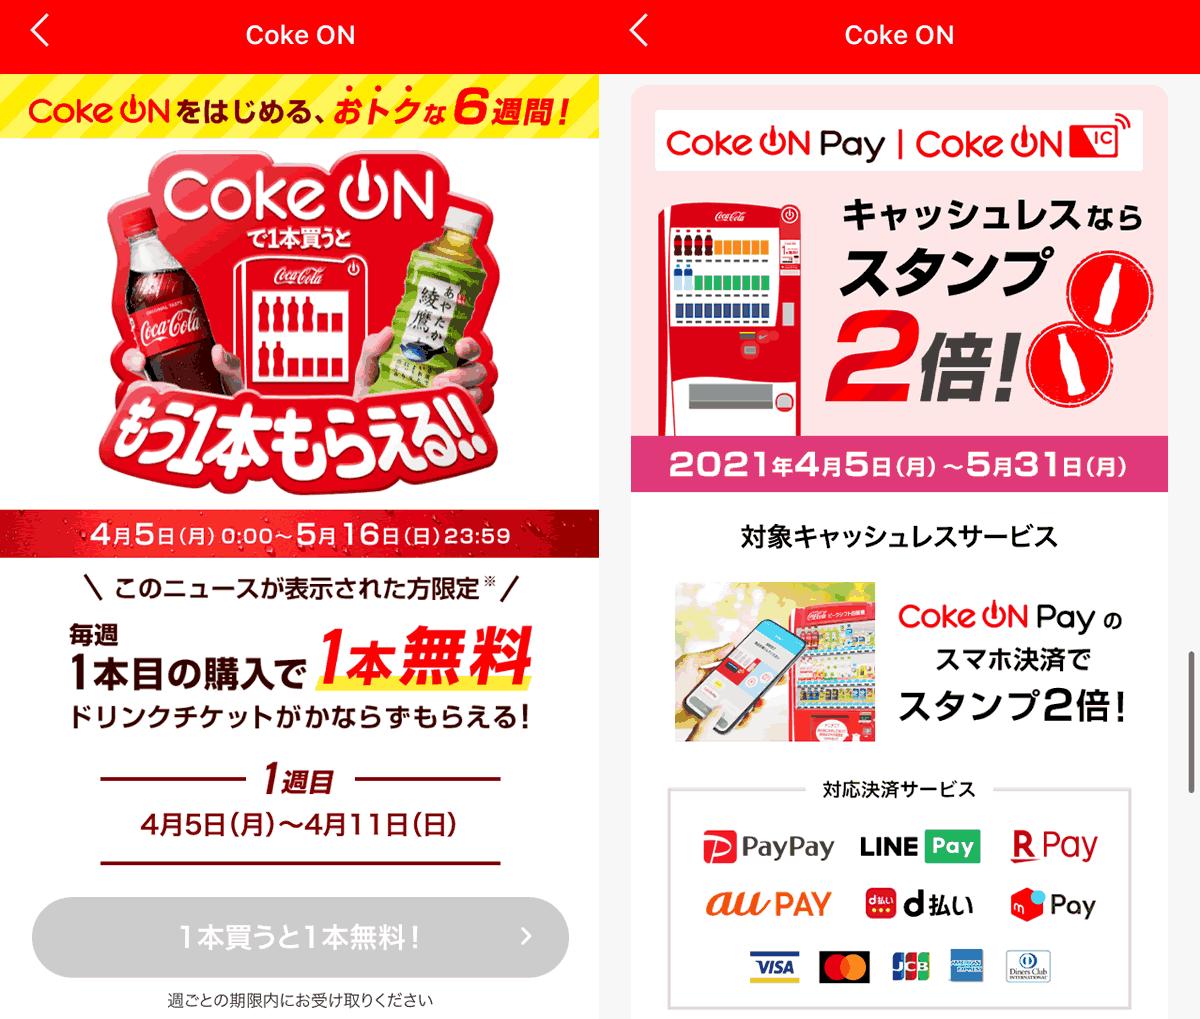 Coke On史上最大のキャンペーン